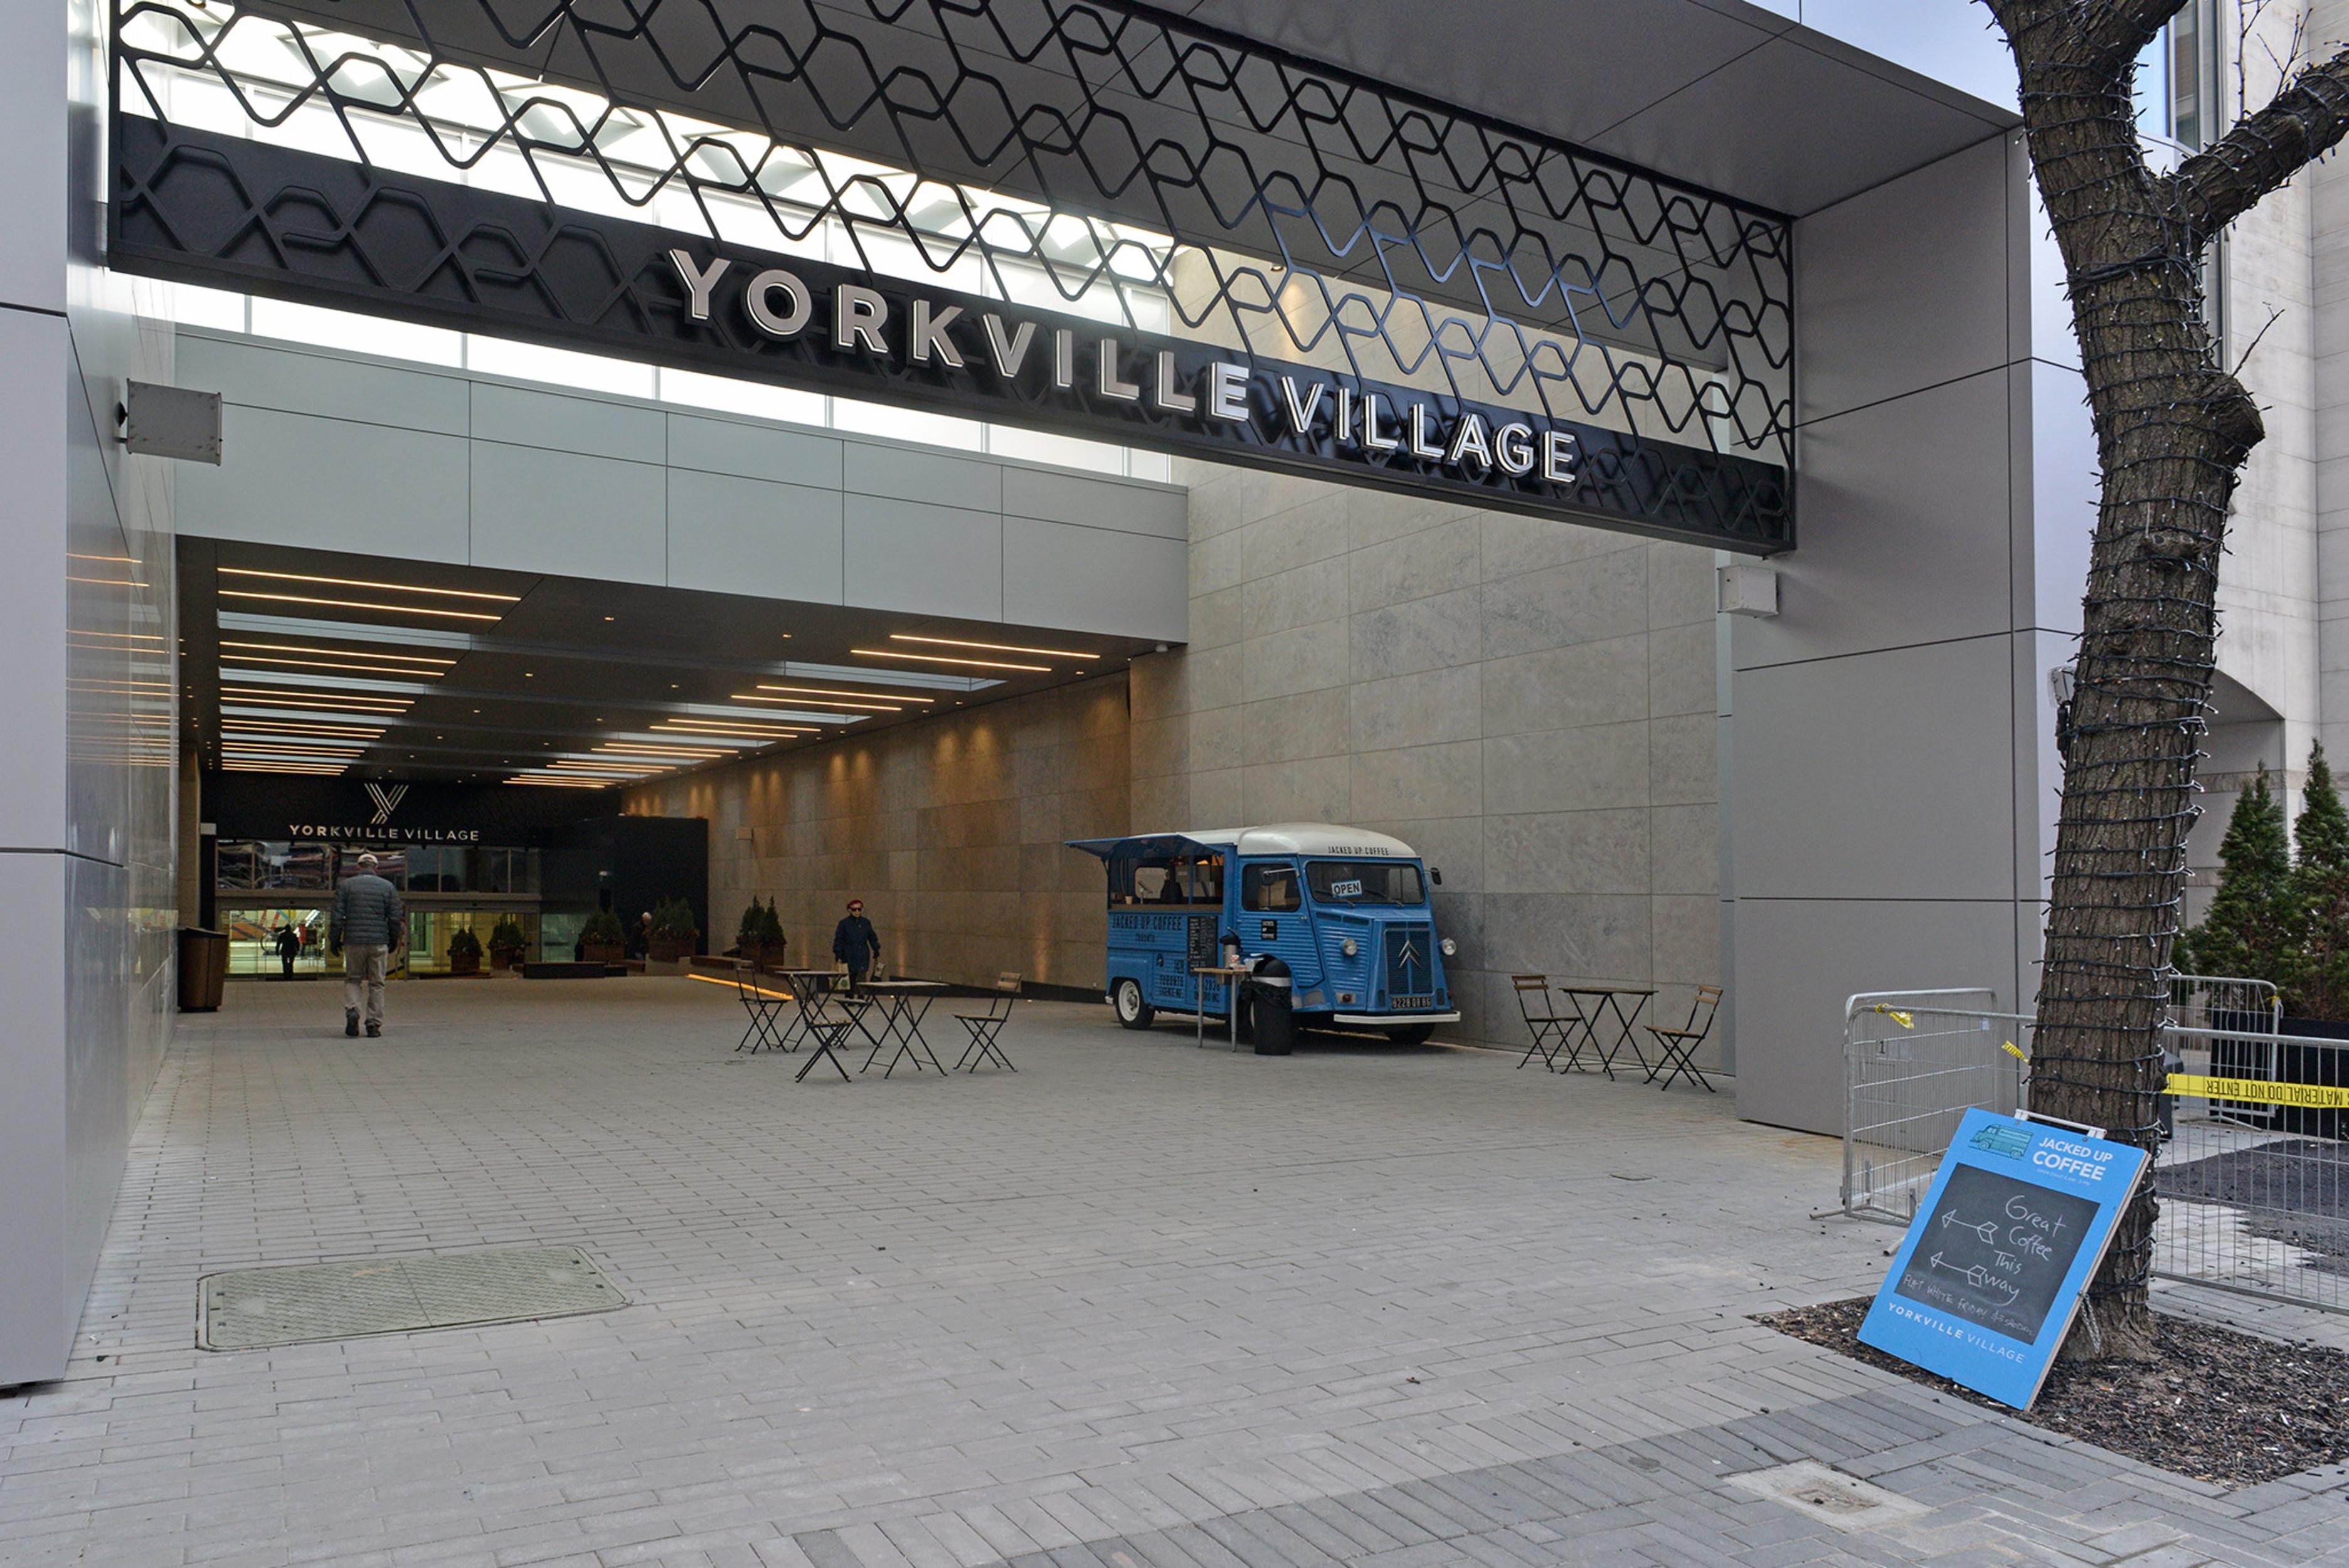 yorkville village toronto